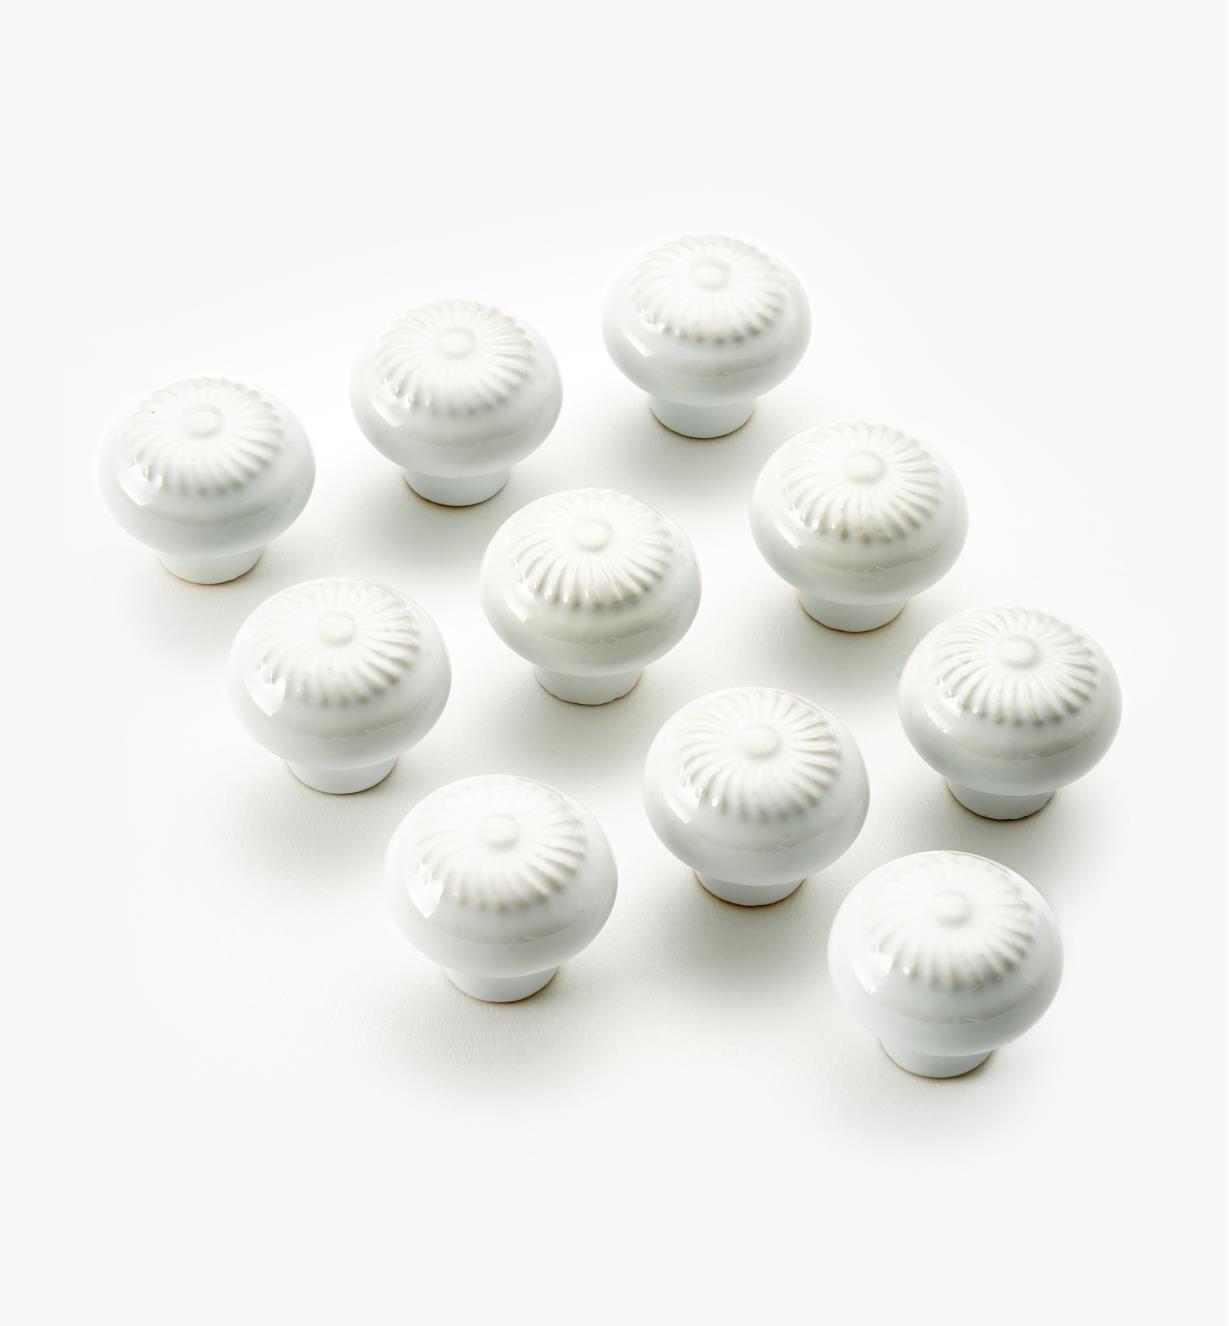 "03W1621 - 1 1/4"" × 1"" Ceramic Embossed Petal Knobs, pkg. of 10"